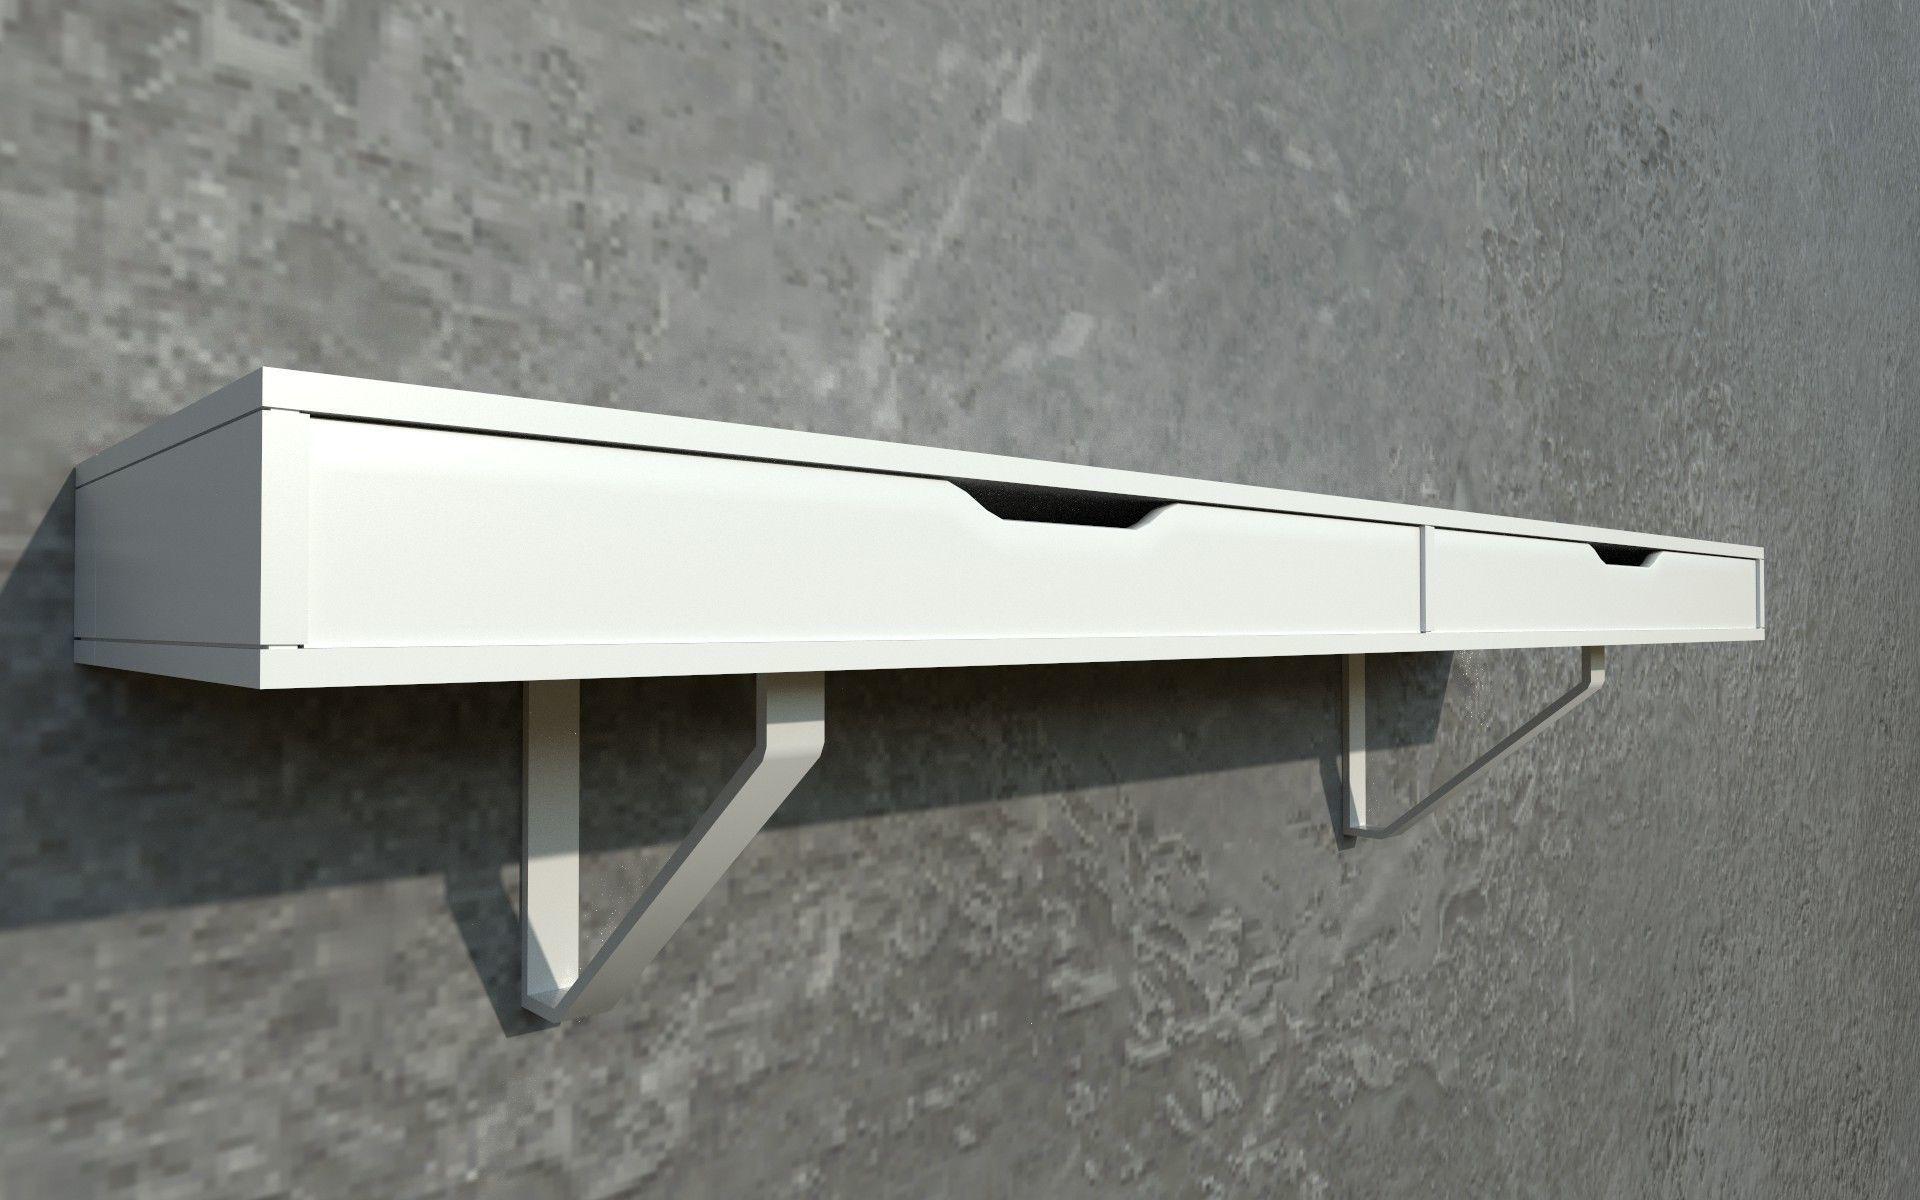 3D et IKEA EKBY ALEX LERBERG Shelf | CGTrader Lerberg Shelf on